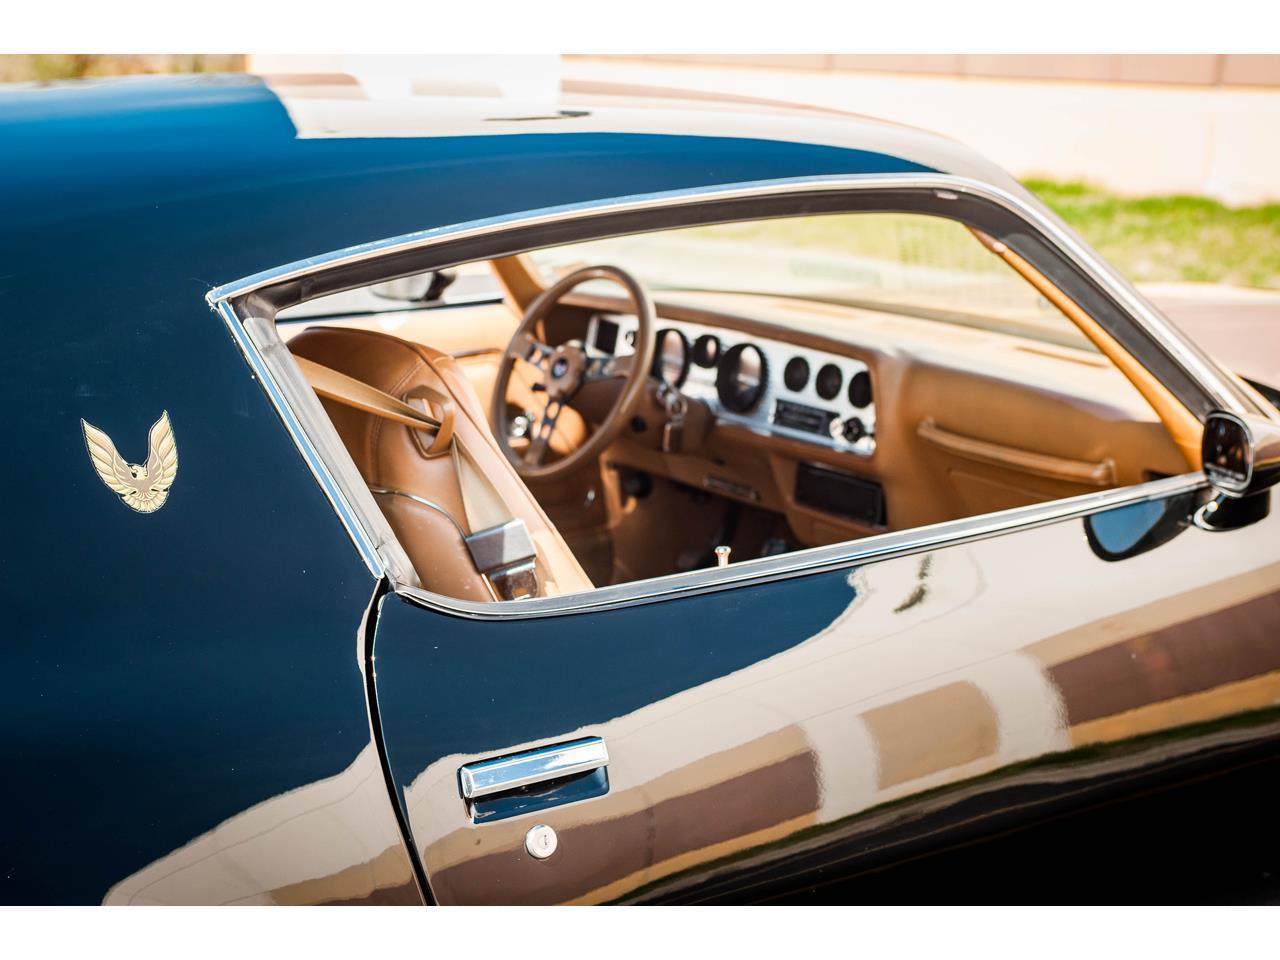 Large Picture of '79 Pontiac Firebird located in O'Fallon Illinois - $36,500.00 - QB8A